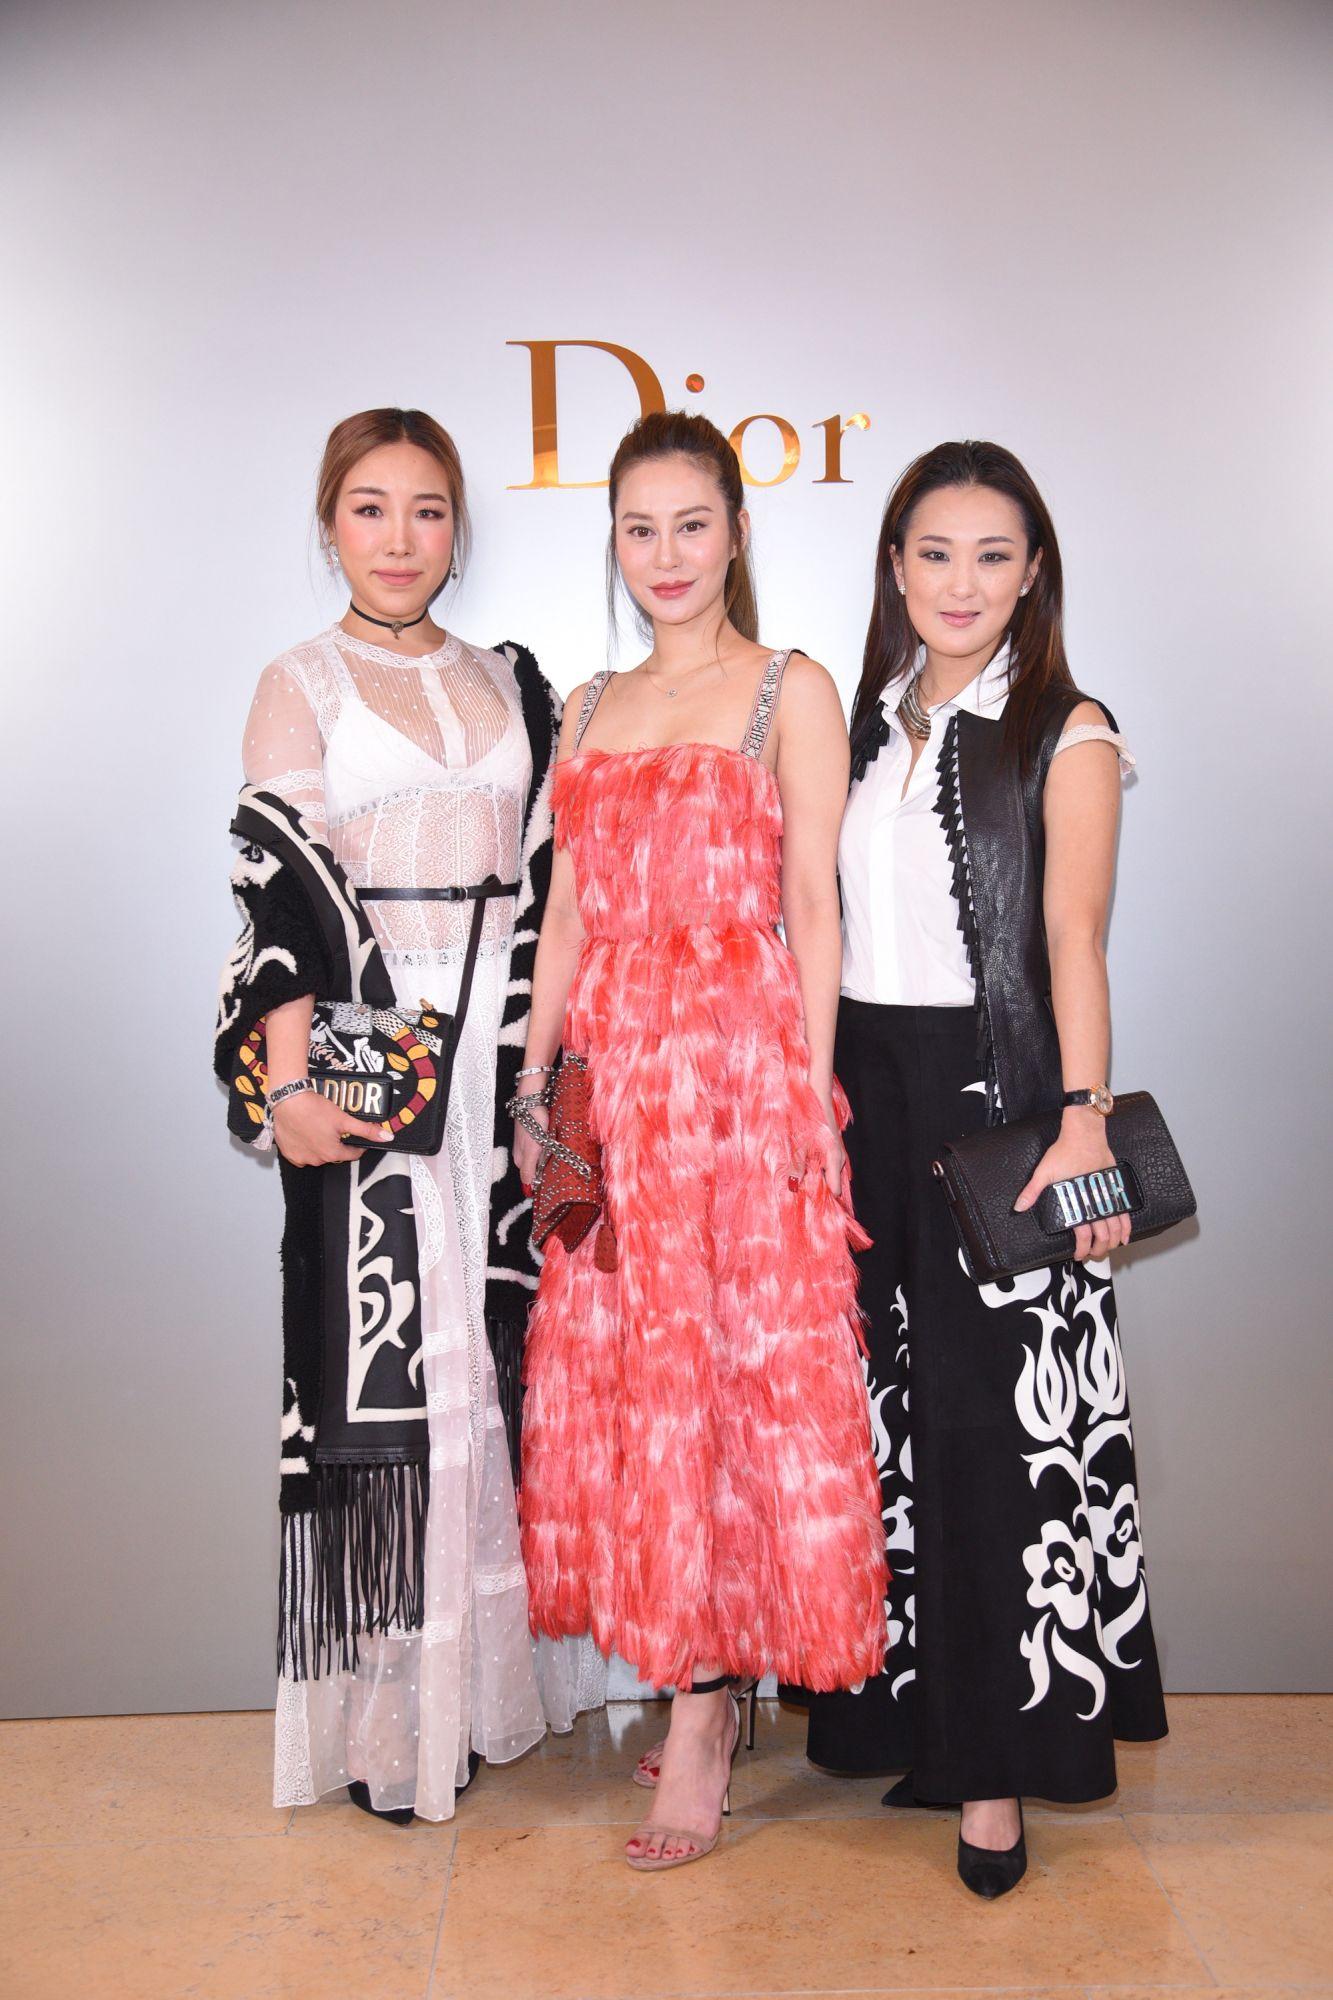 Feiping Chang, Eleanor Lam, Antonia Li